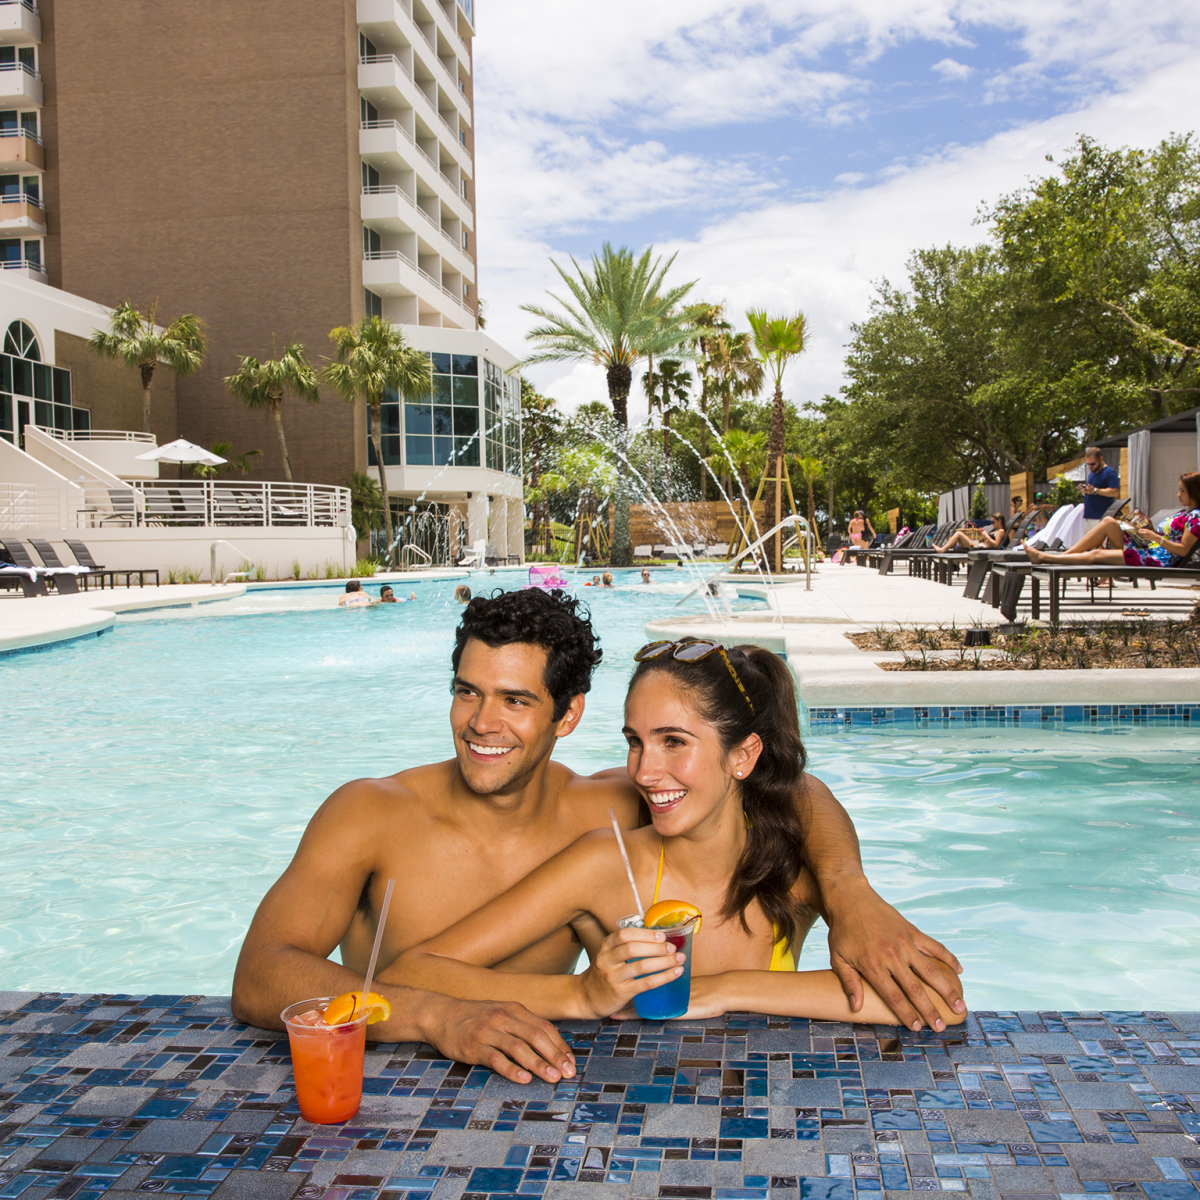 South Shore Harbour Resort pool